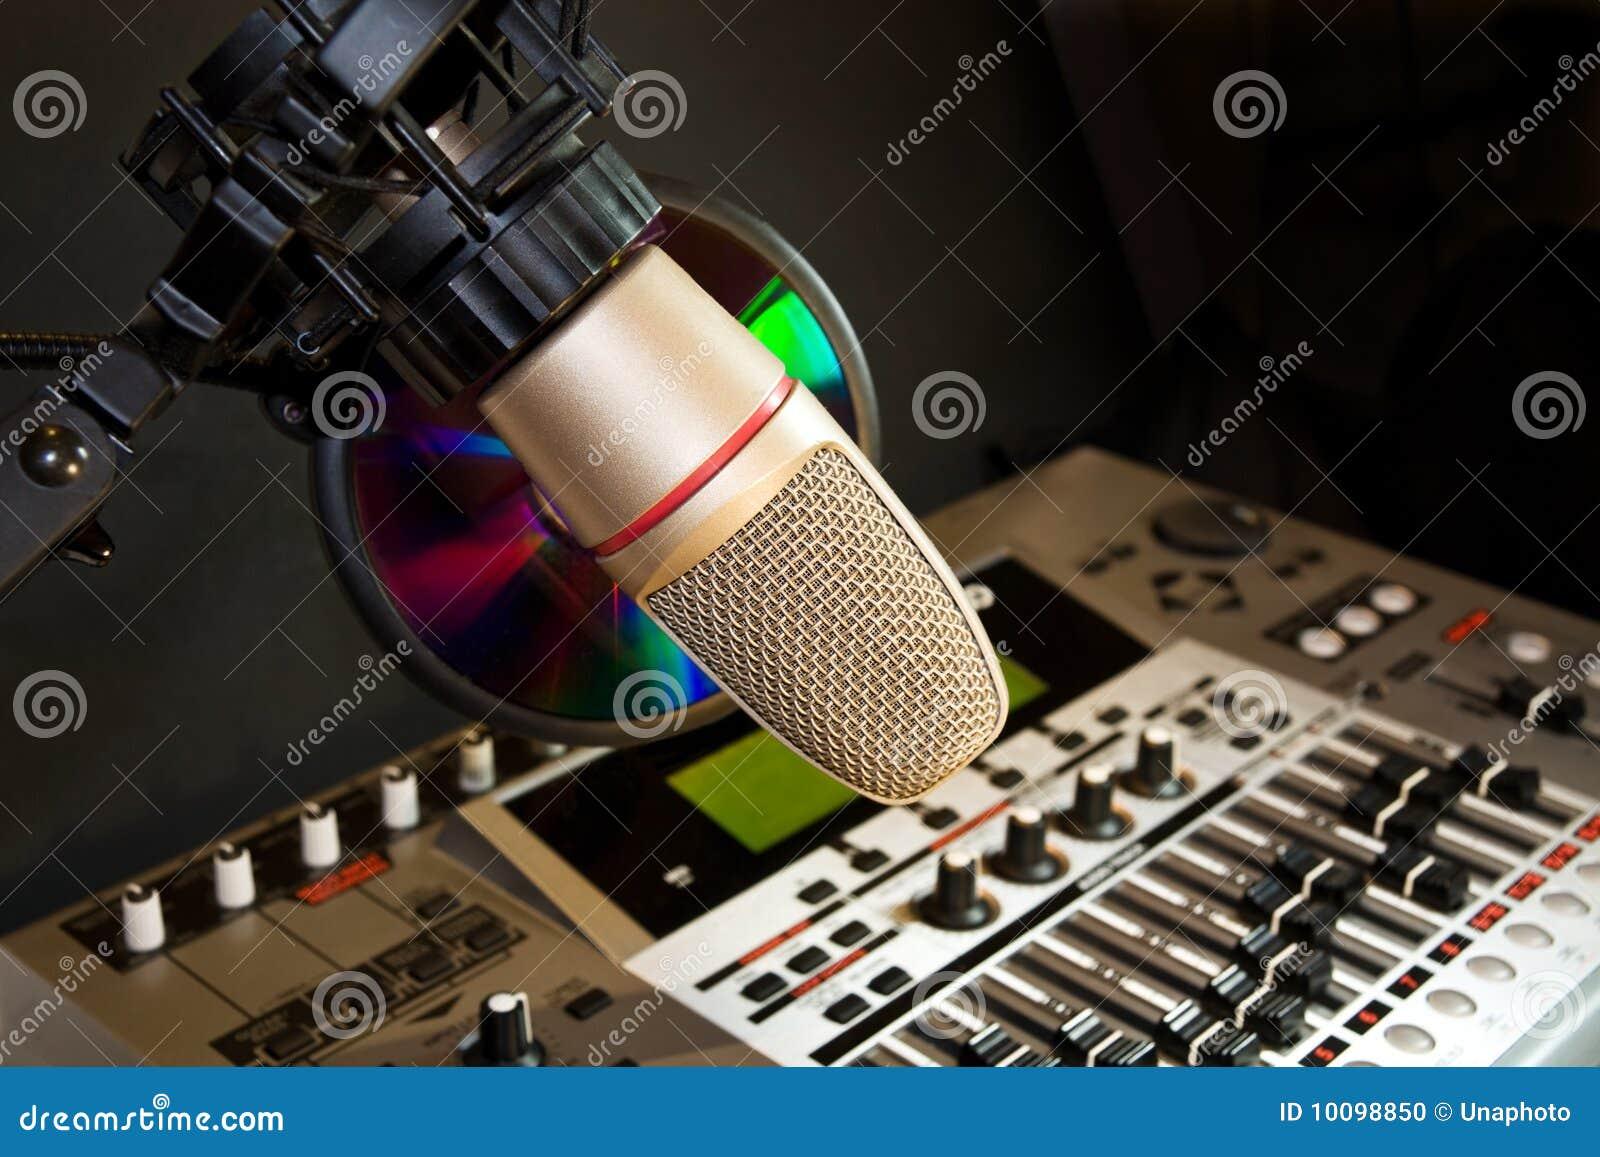 Sound Detonator Recording Equalizer (EQ Software) - DAK Industries